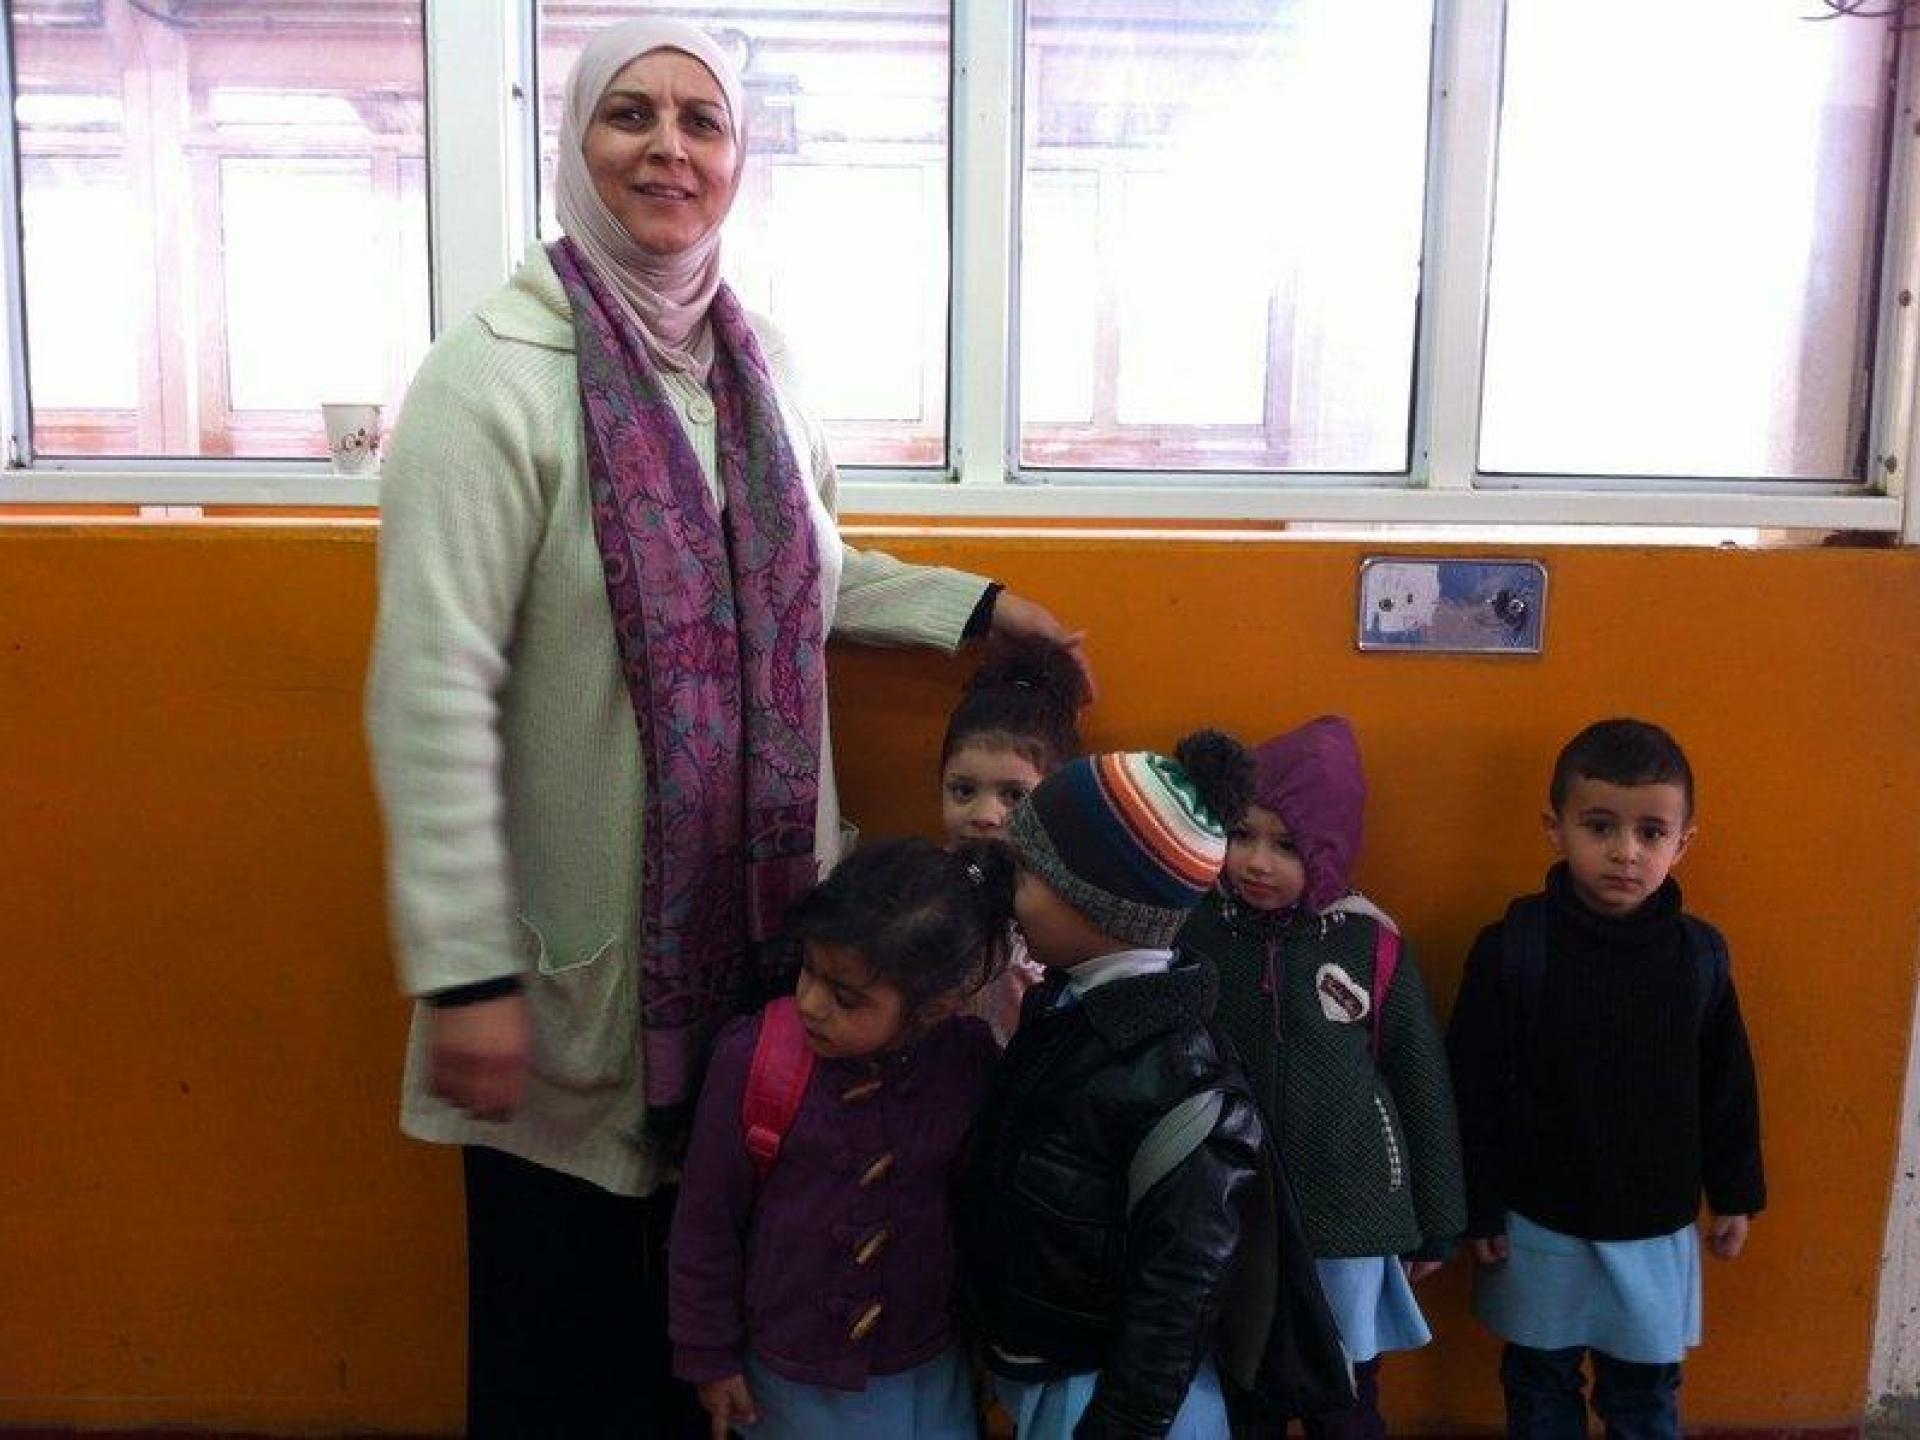 Ras abu Sbeitan/Zeitim checkpoint 05.02.13